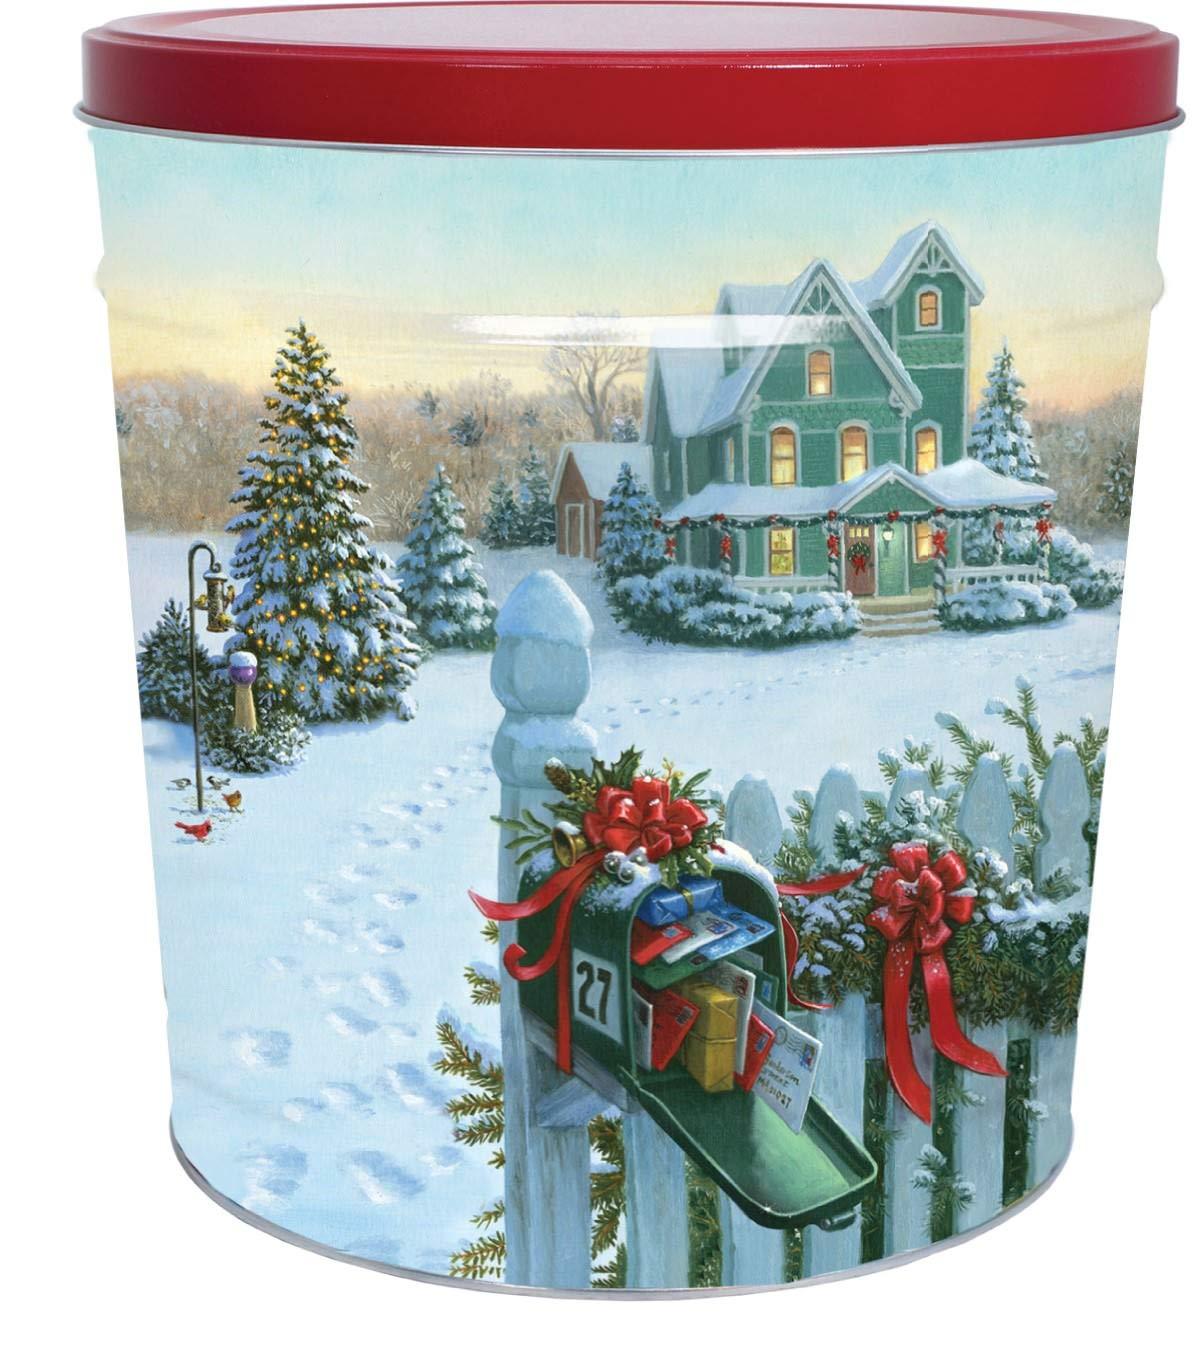 C.R. Frank Popcorn - Gourmet Popcorn Tin, 3.5 Gallon, Christmas Mail (3 Way Butter, Cheese, and Caramel)